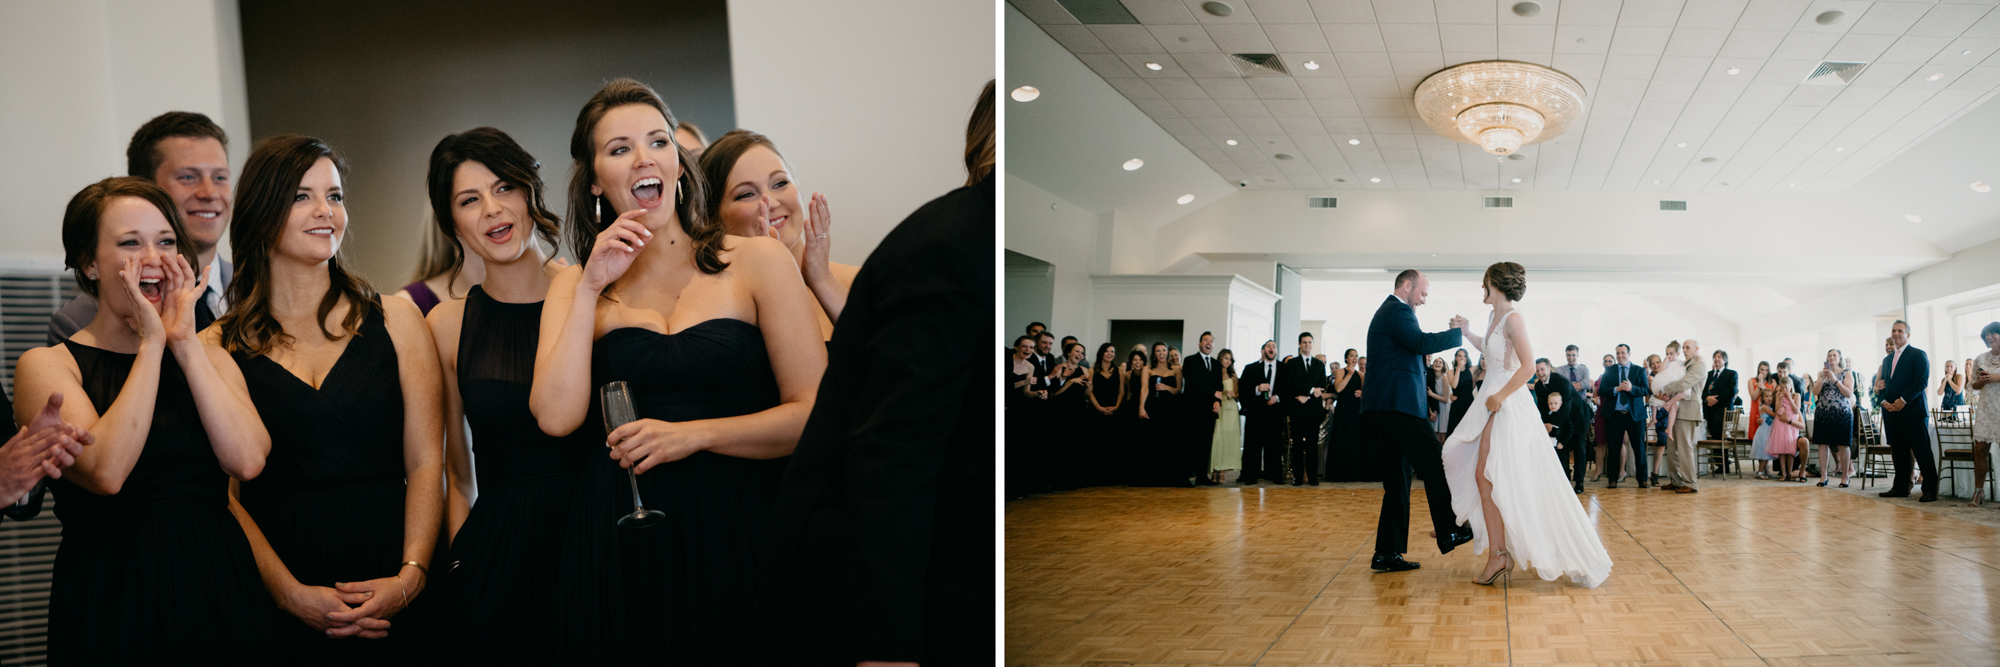 Jaclyn_Andrew_quincy_massachusetts_wedding026.jpg